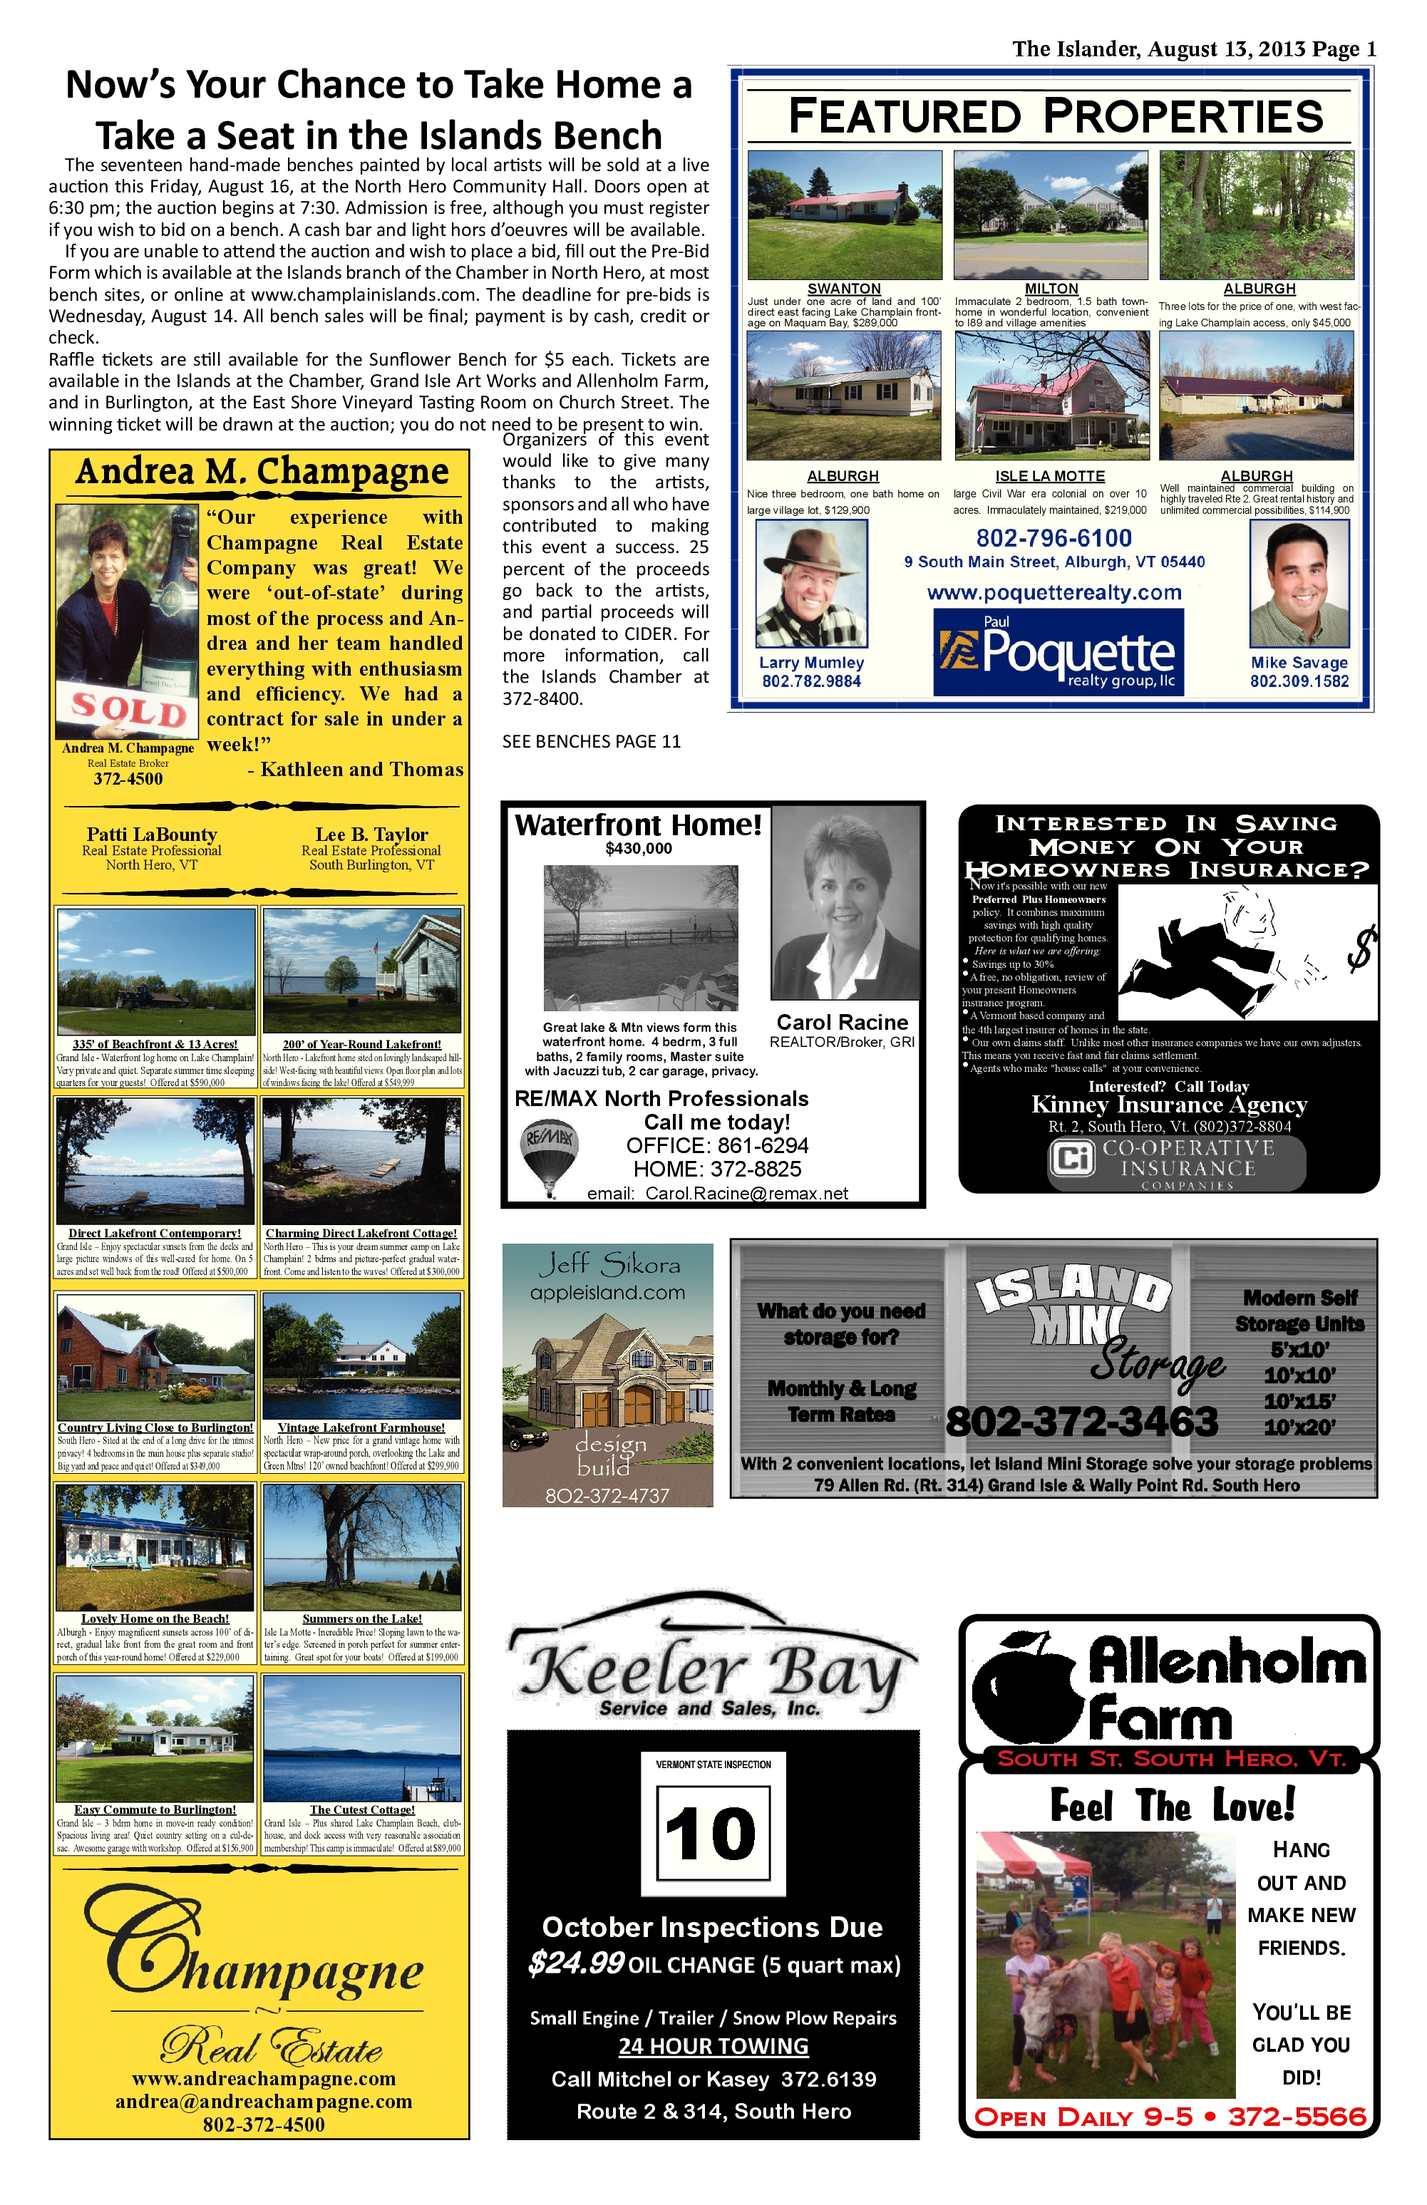 The Islander, August 13, 2013